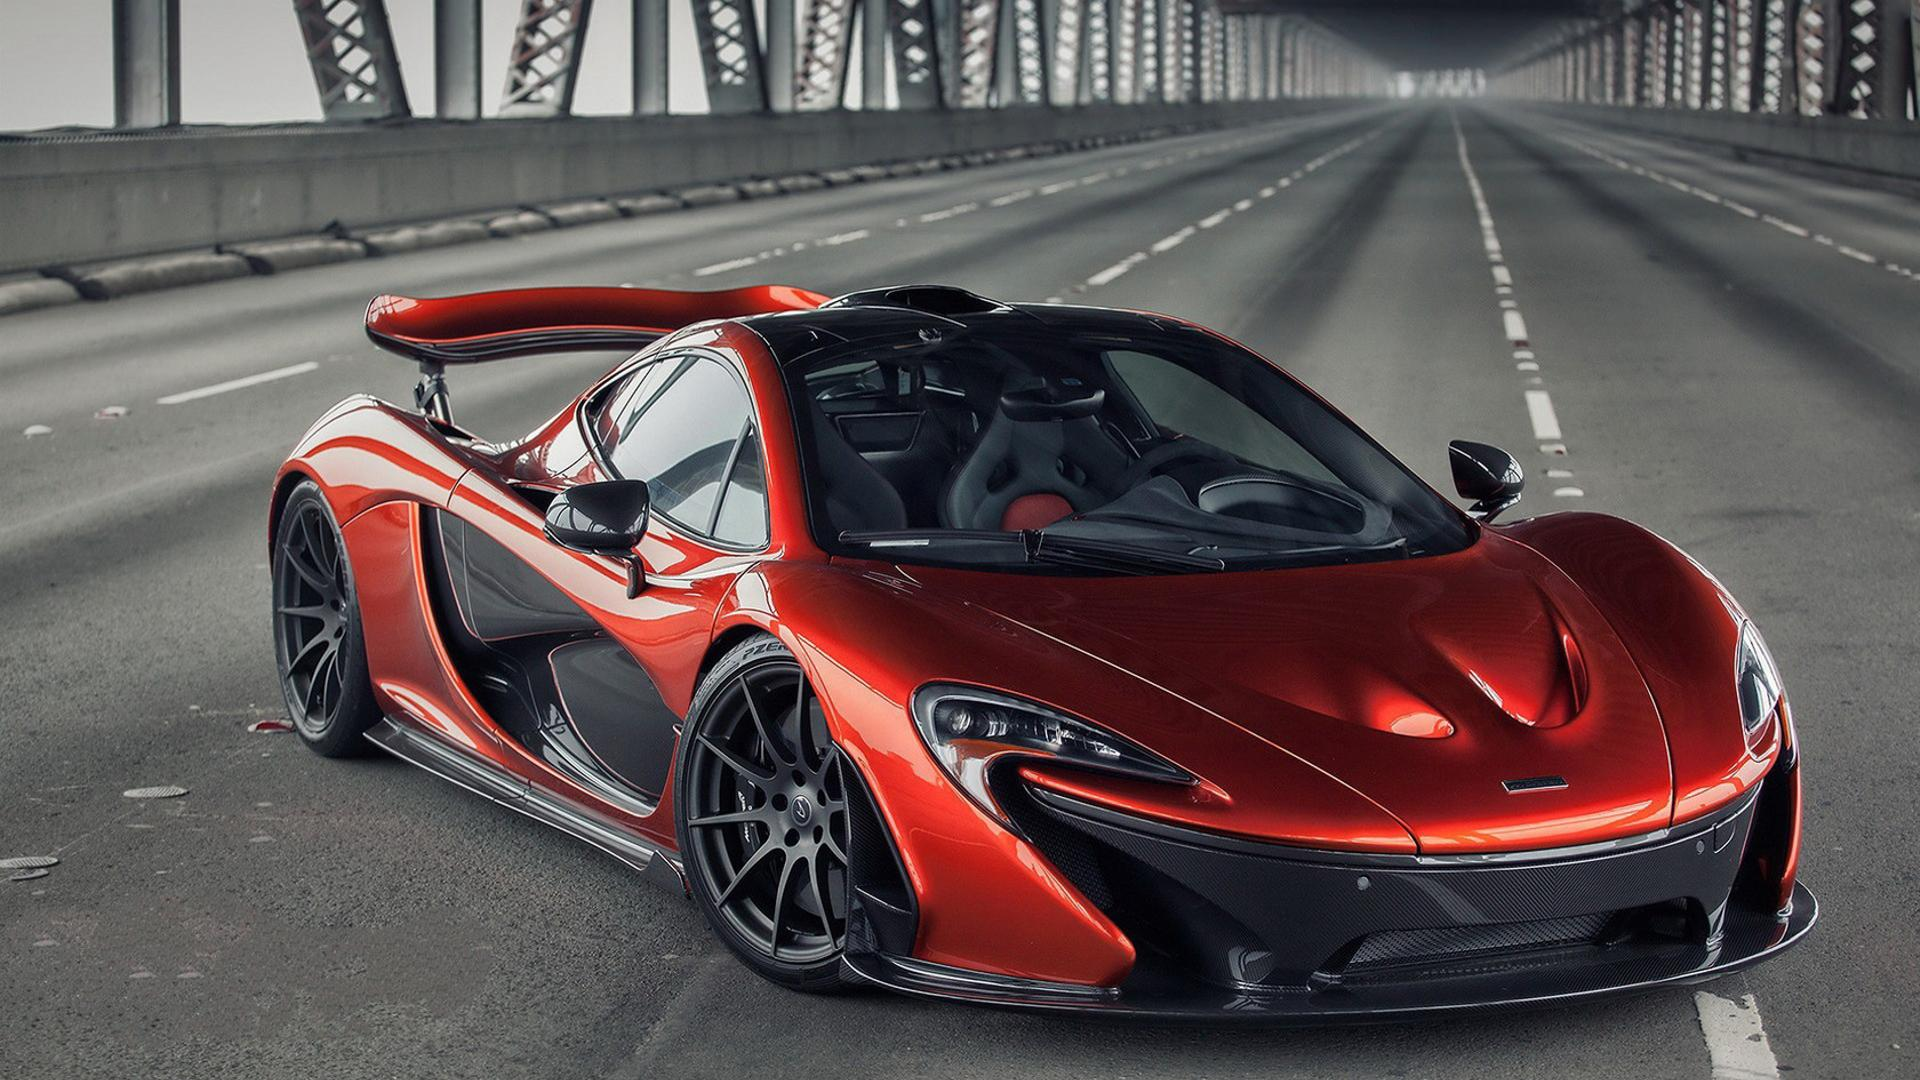 Red McLaren P1 on a bridge - Sport car Wallpaper Download ...